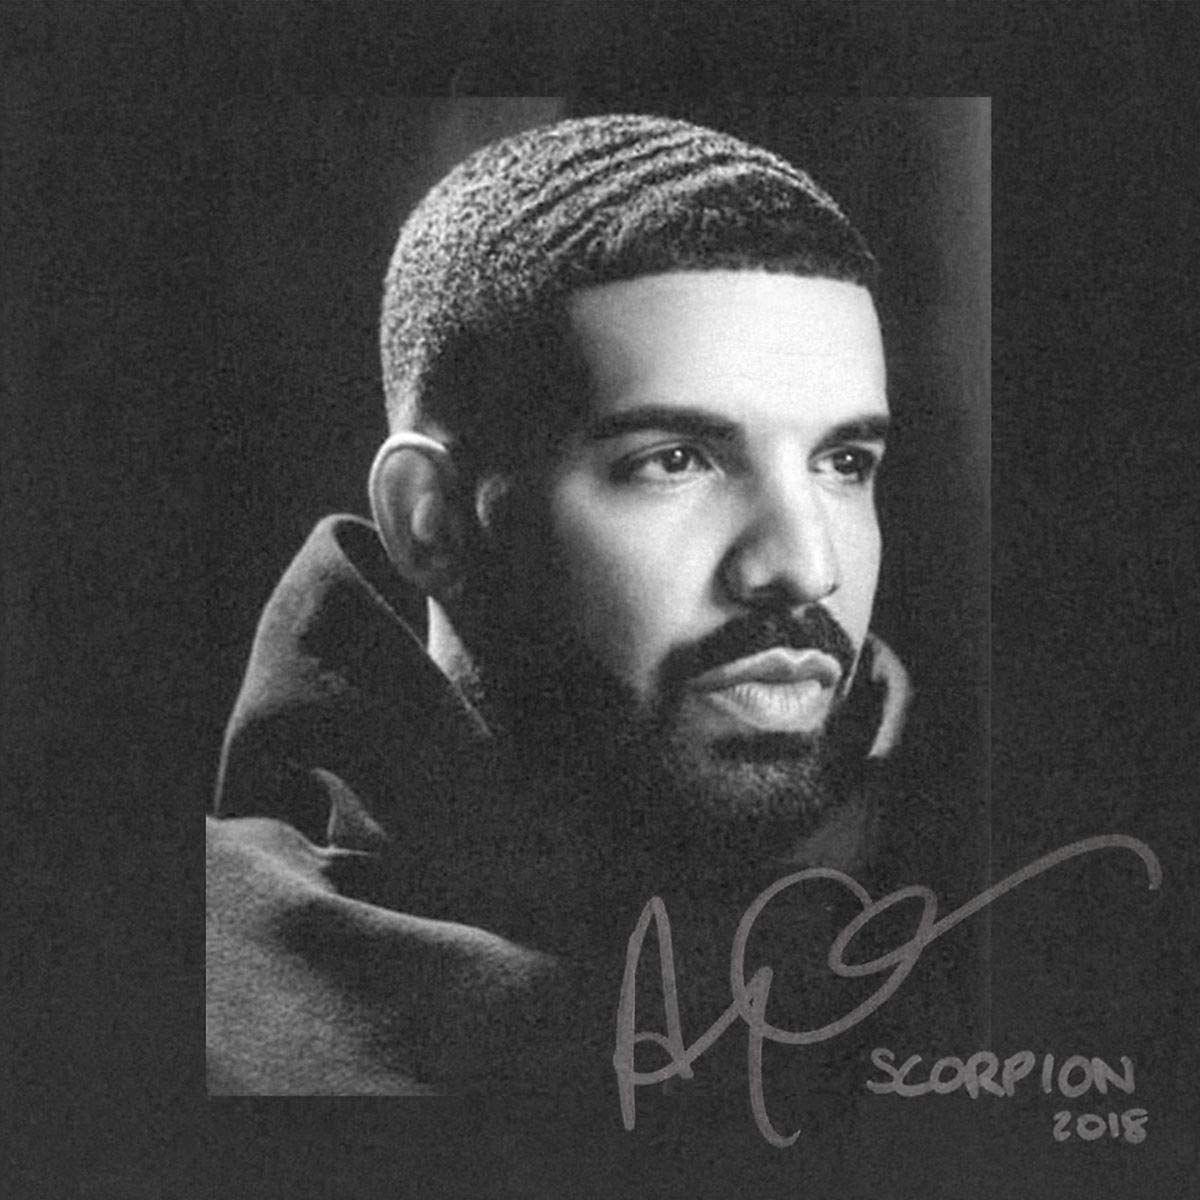 Drake Drake. Scorpion (2 LP) drake drake scorpion 2 lp